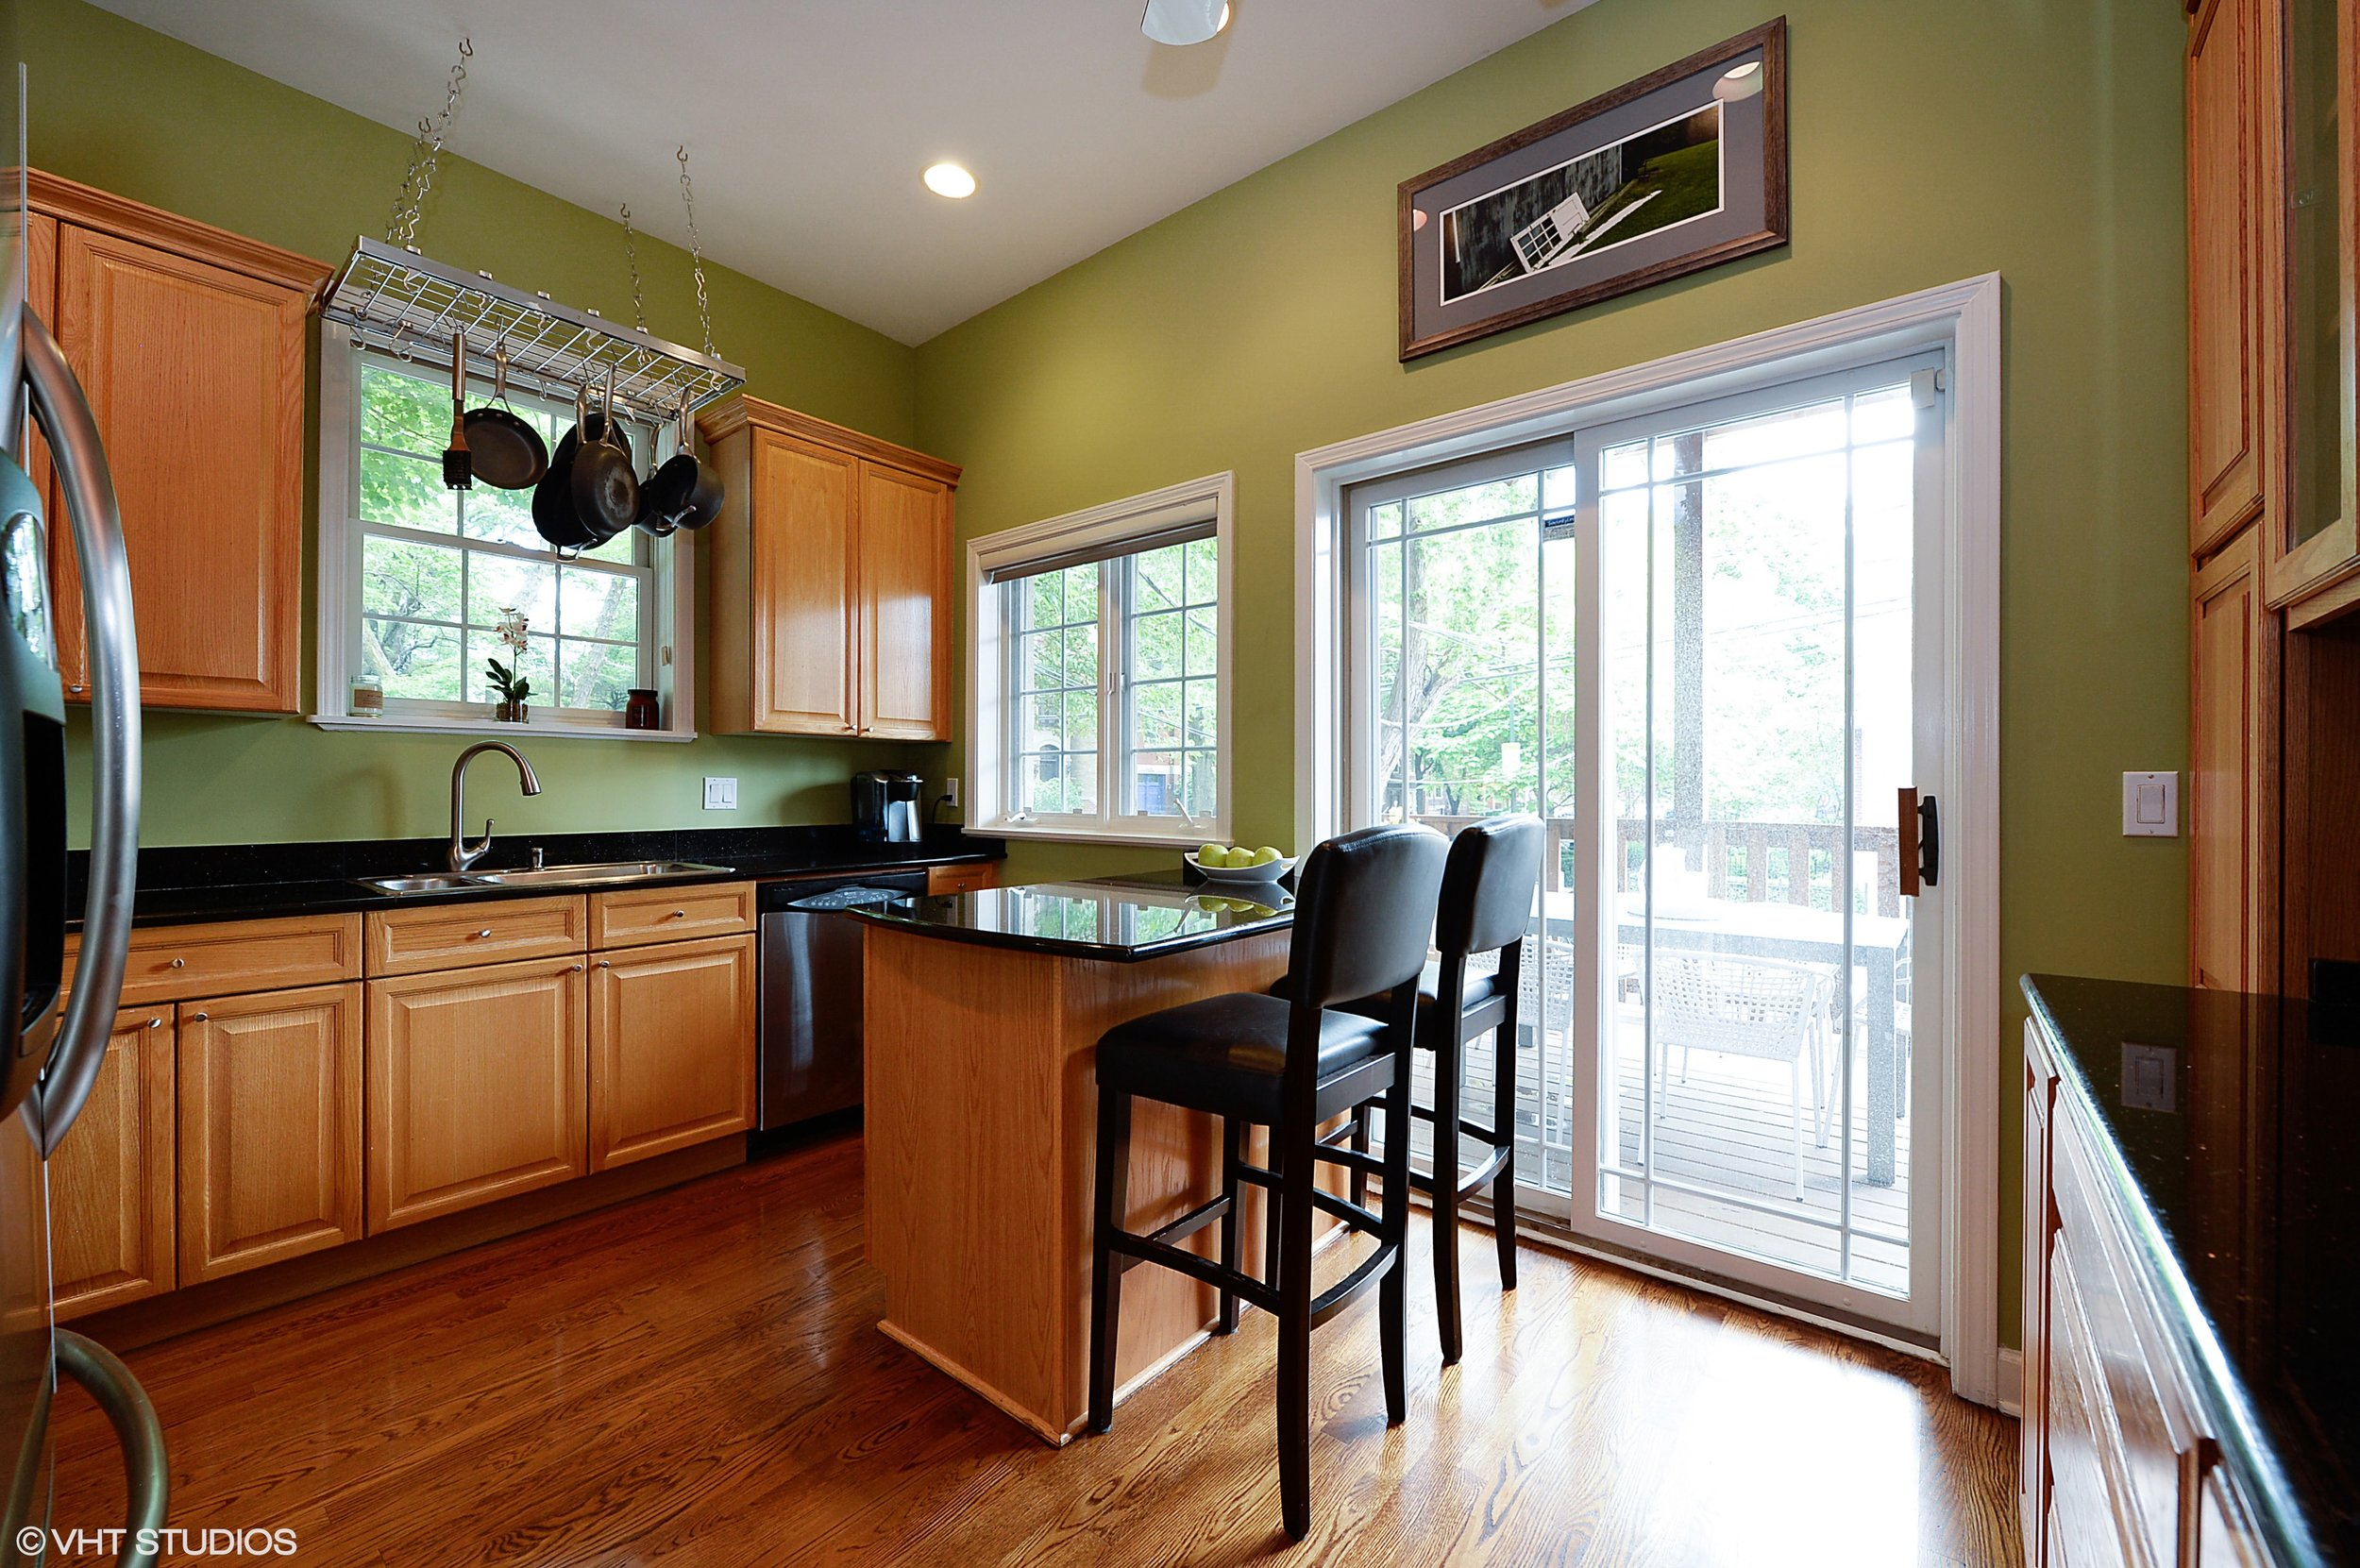 04_1901WestArmitageAve_1E_5_Kitchen_HiRes.jpg